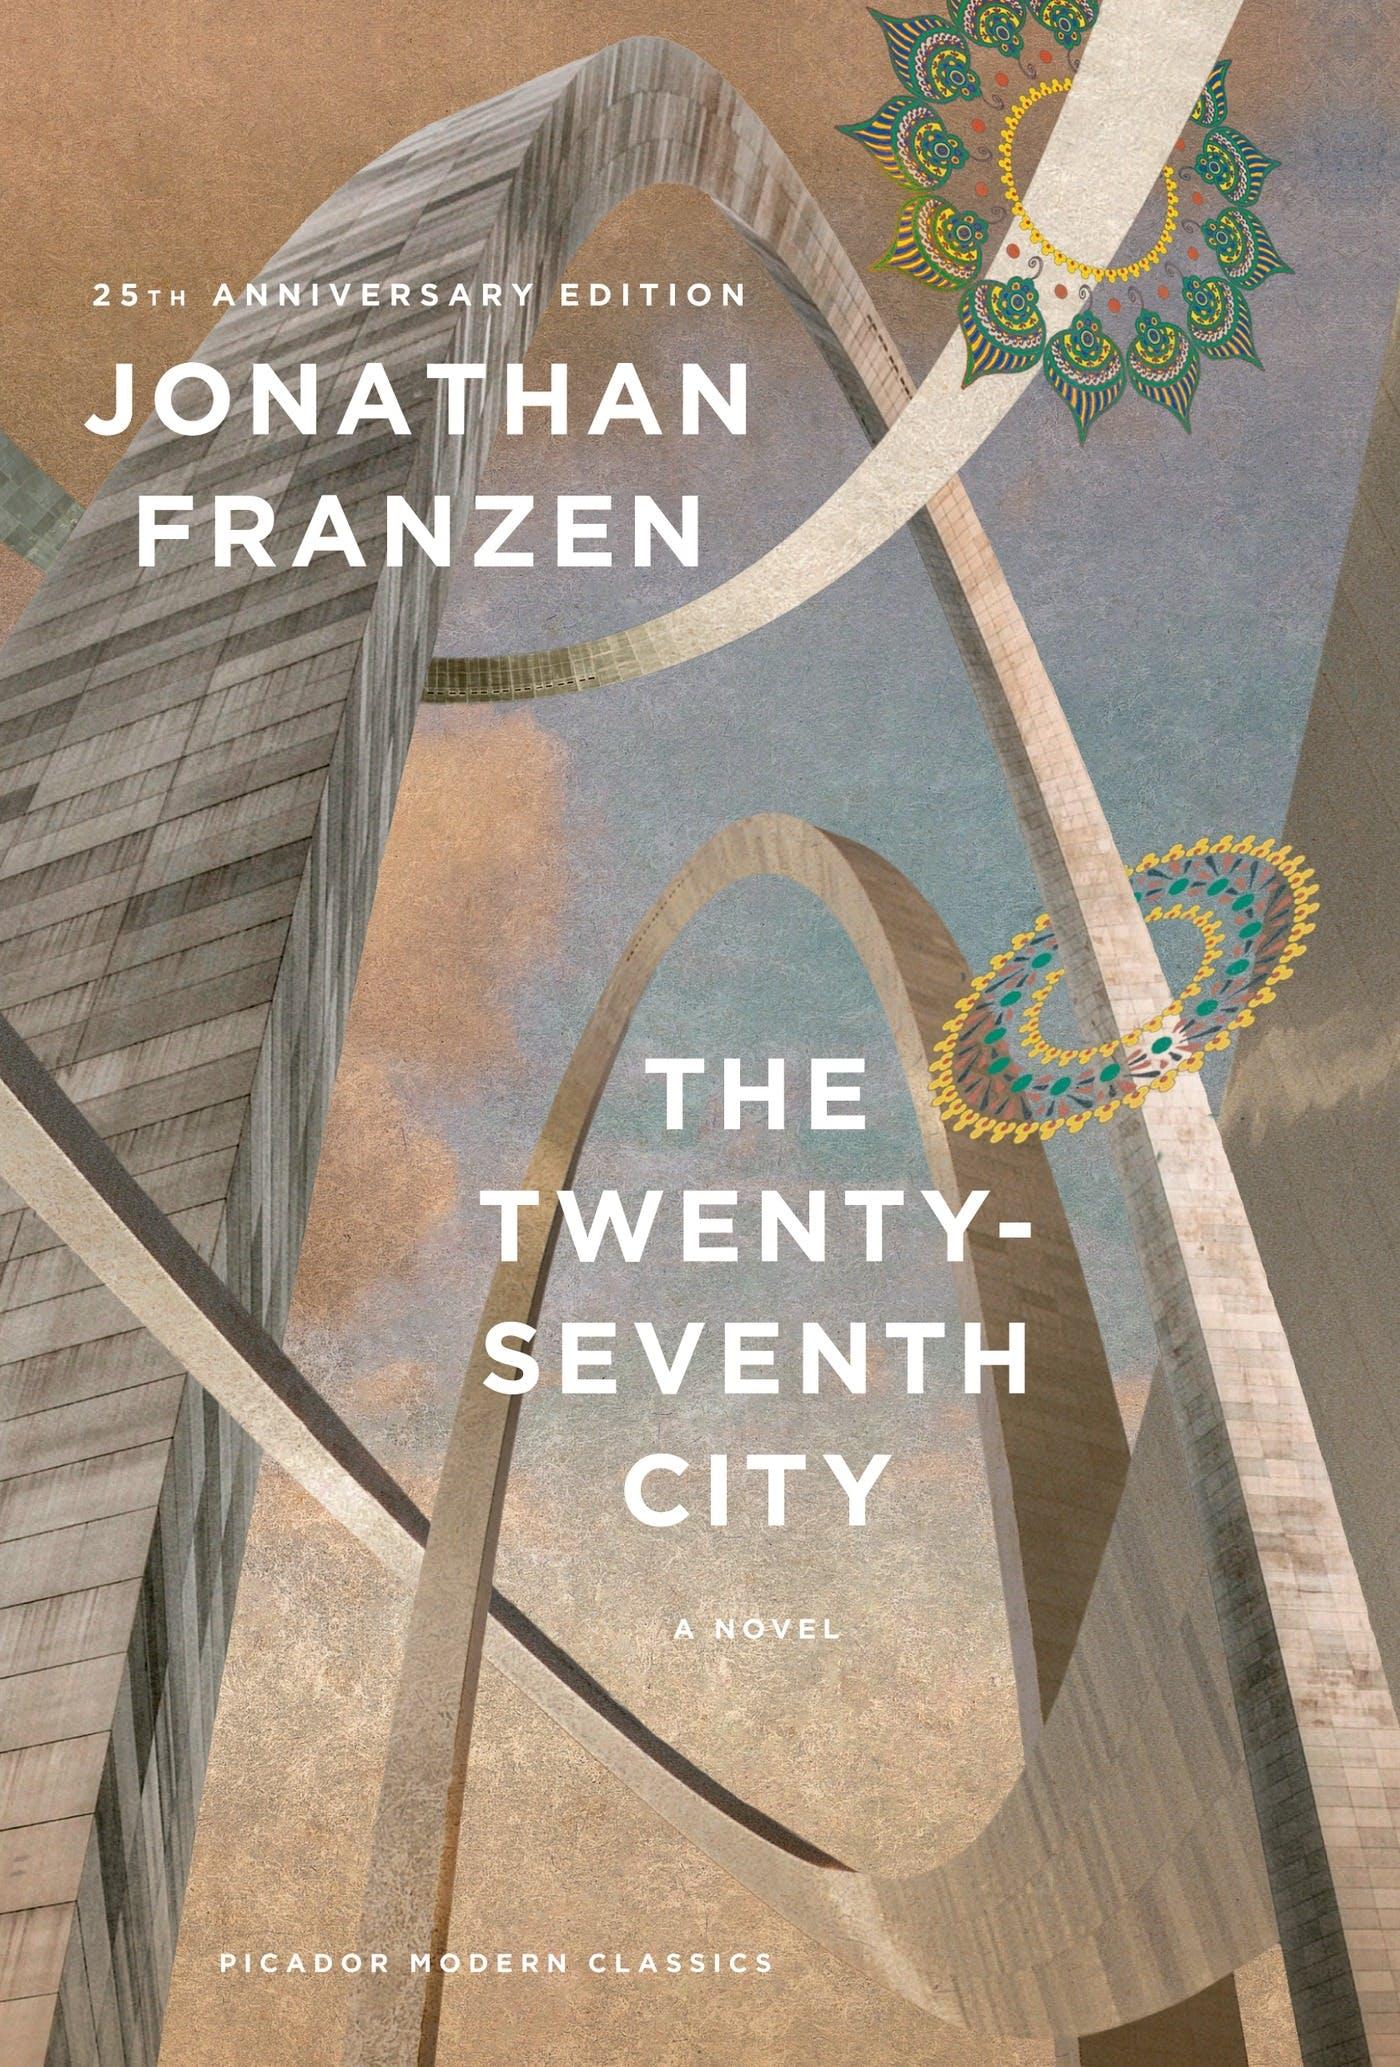 Image of The Twenty-Seventh City